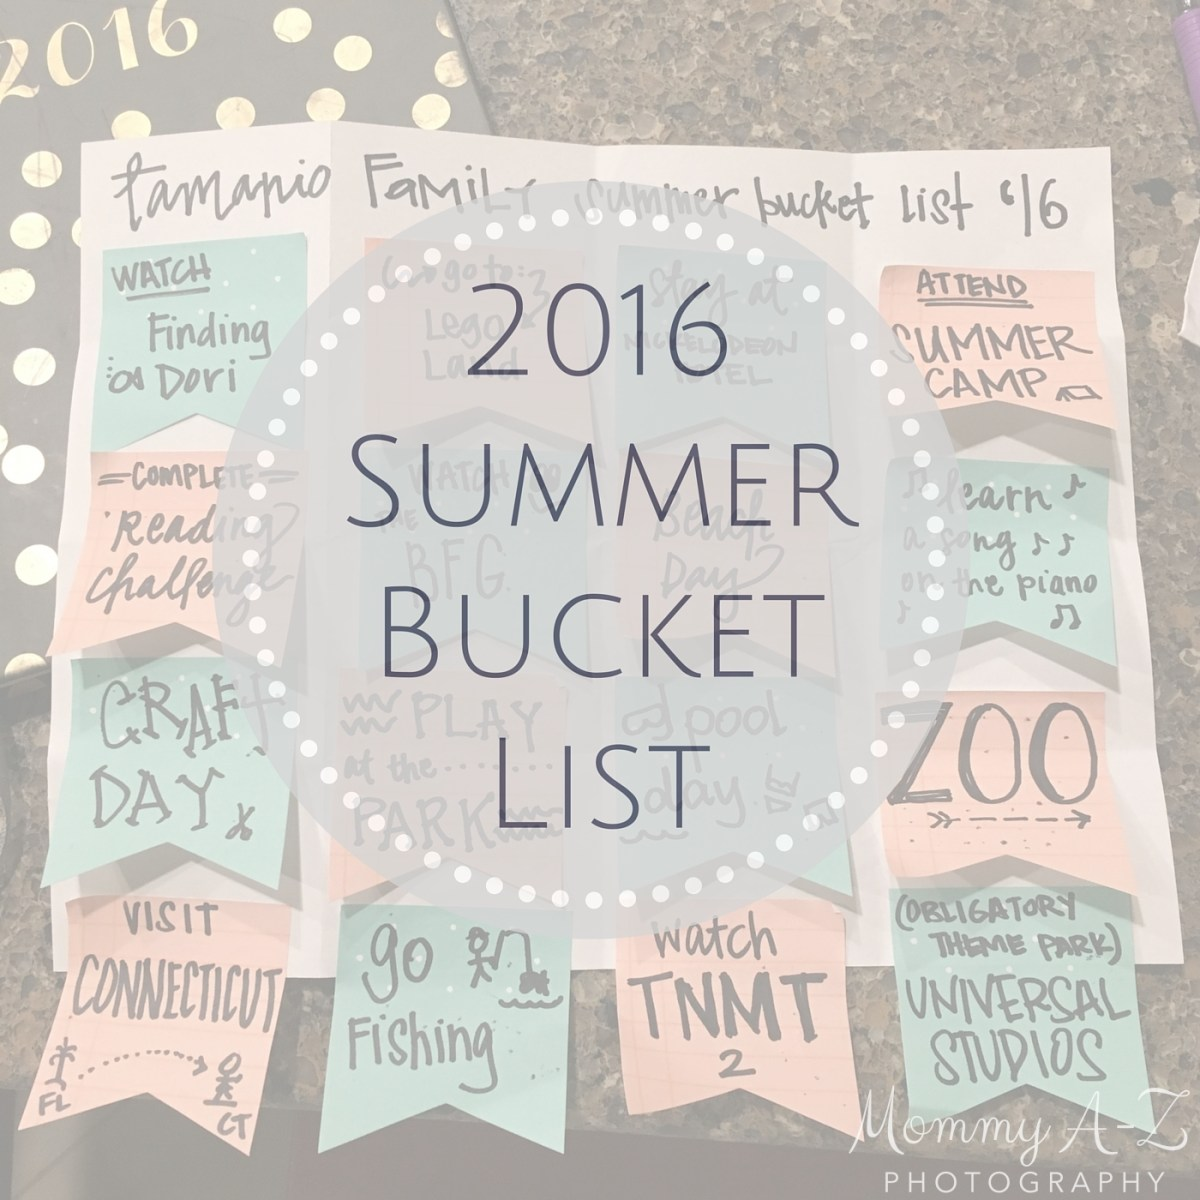 Summer Bucket List 2016